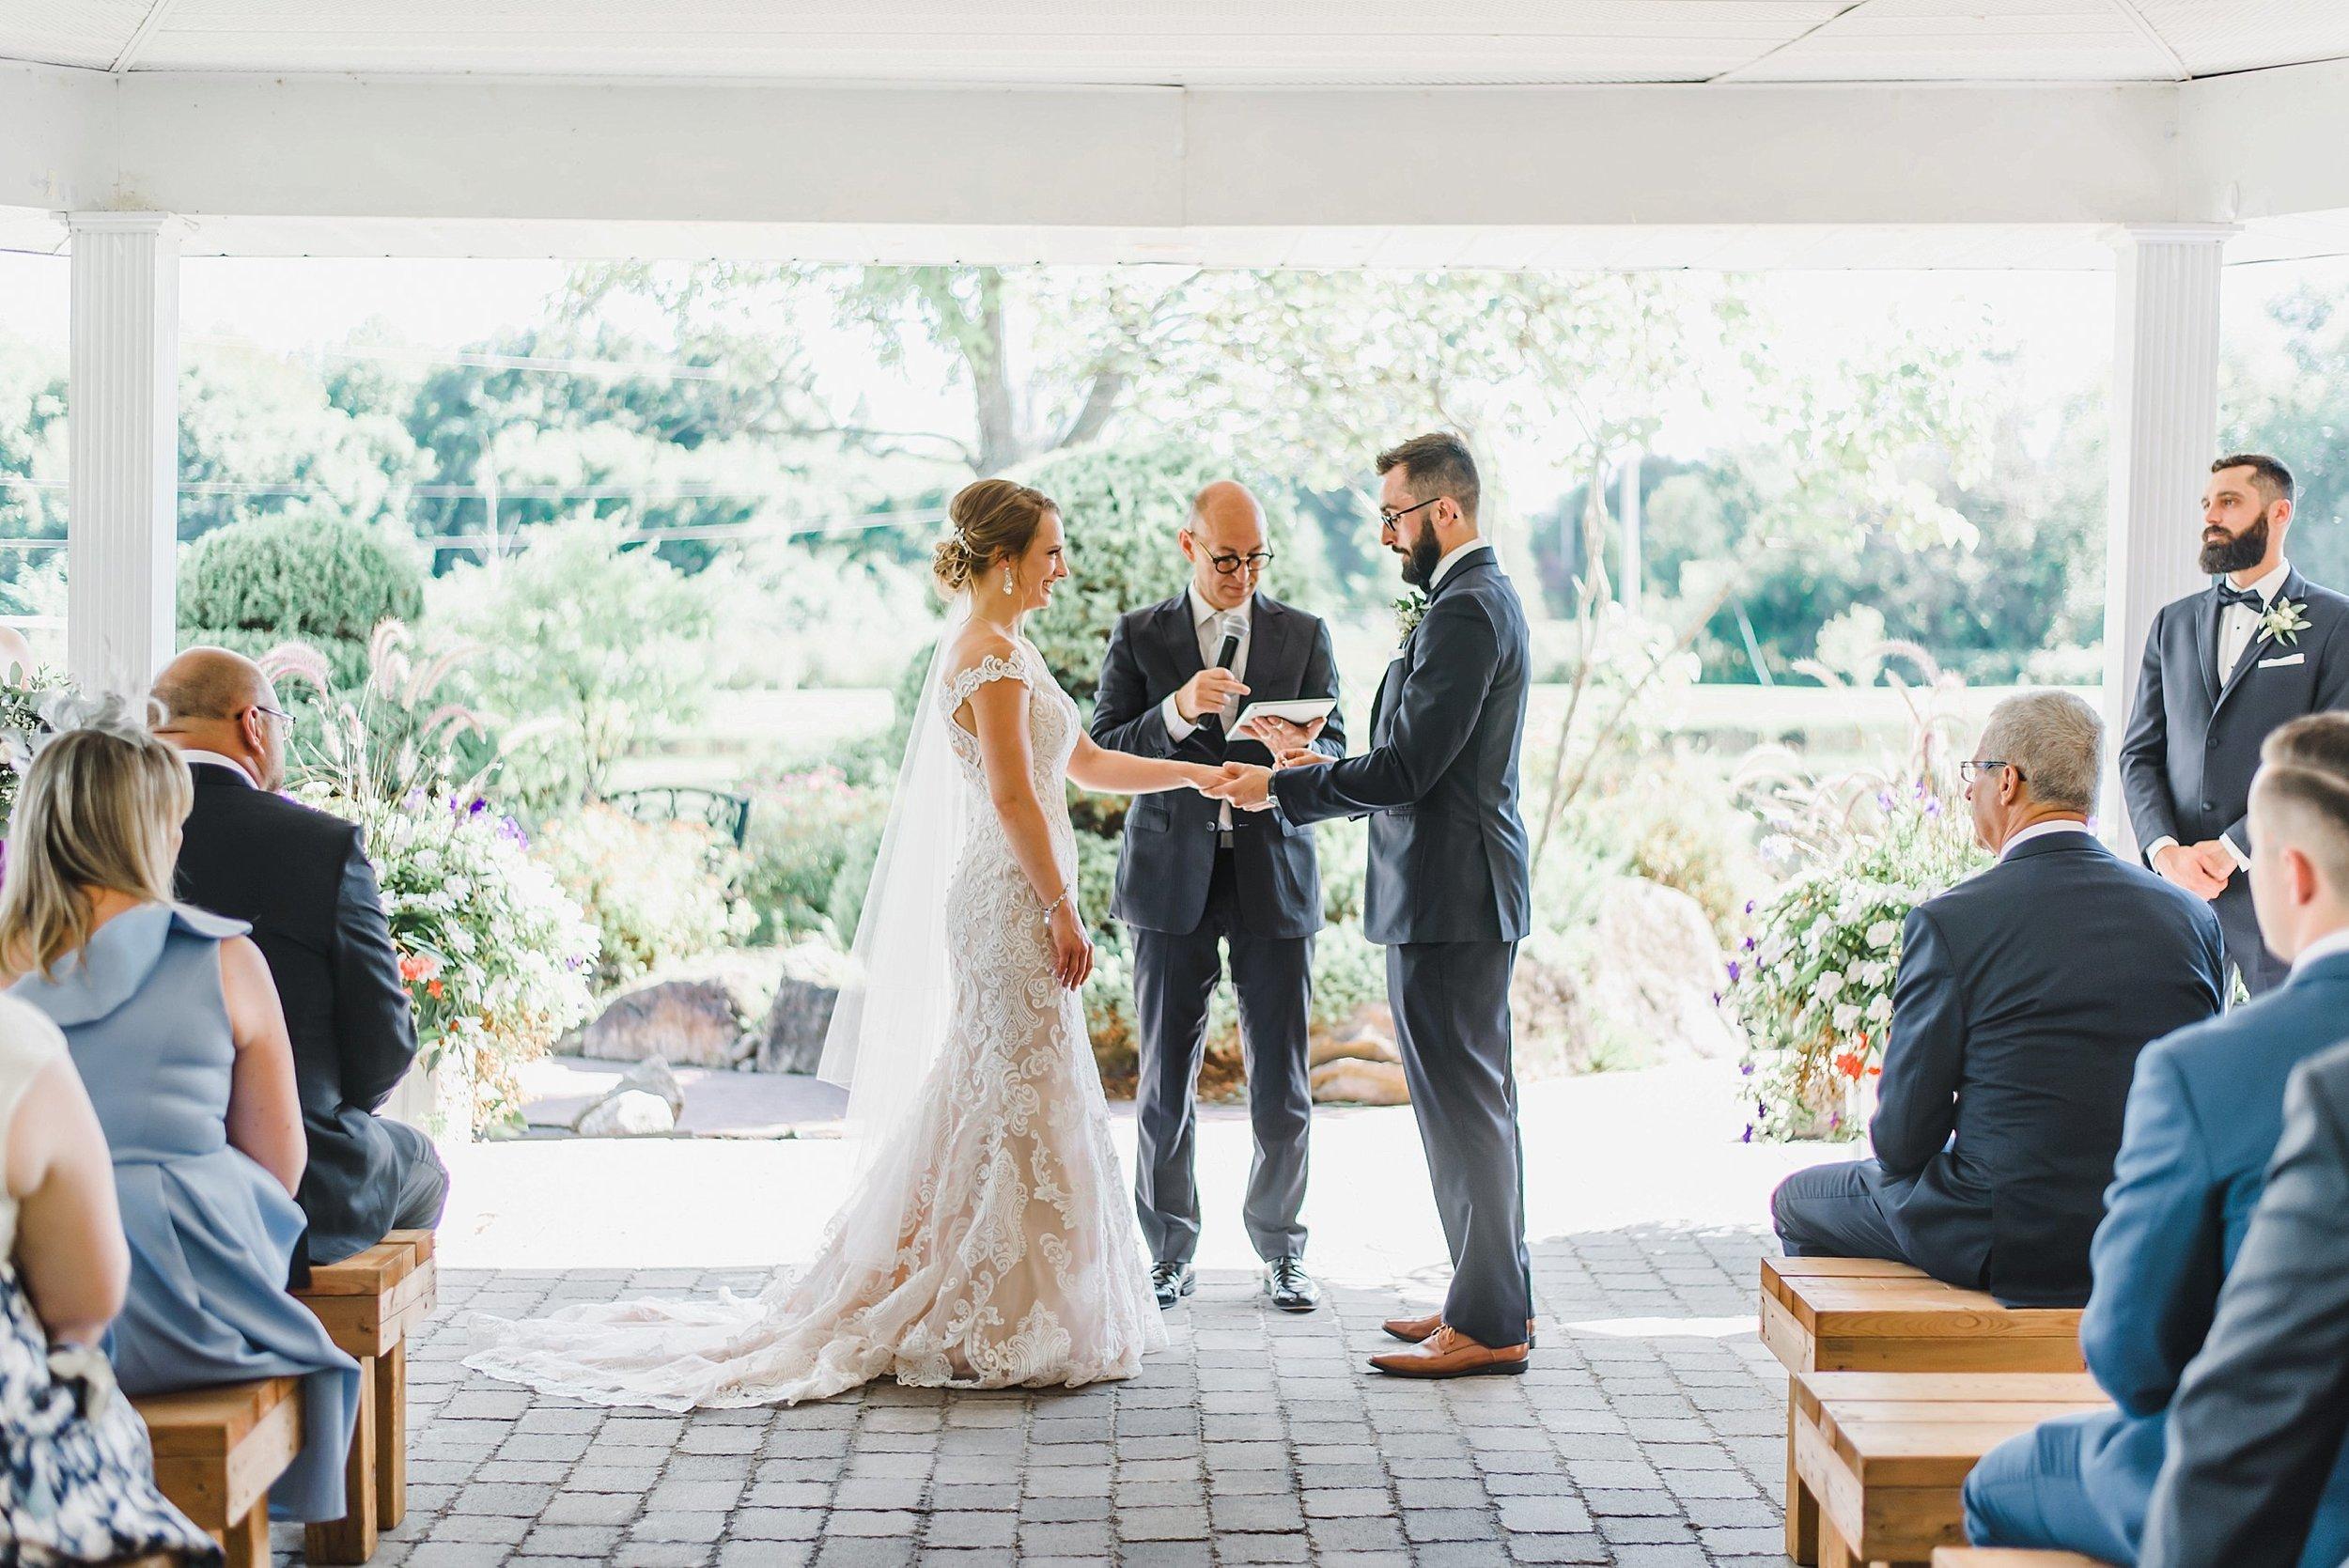 light airy indie fine art ottawa wedding photographer | Ali and Batoul Photography_1276.jpg